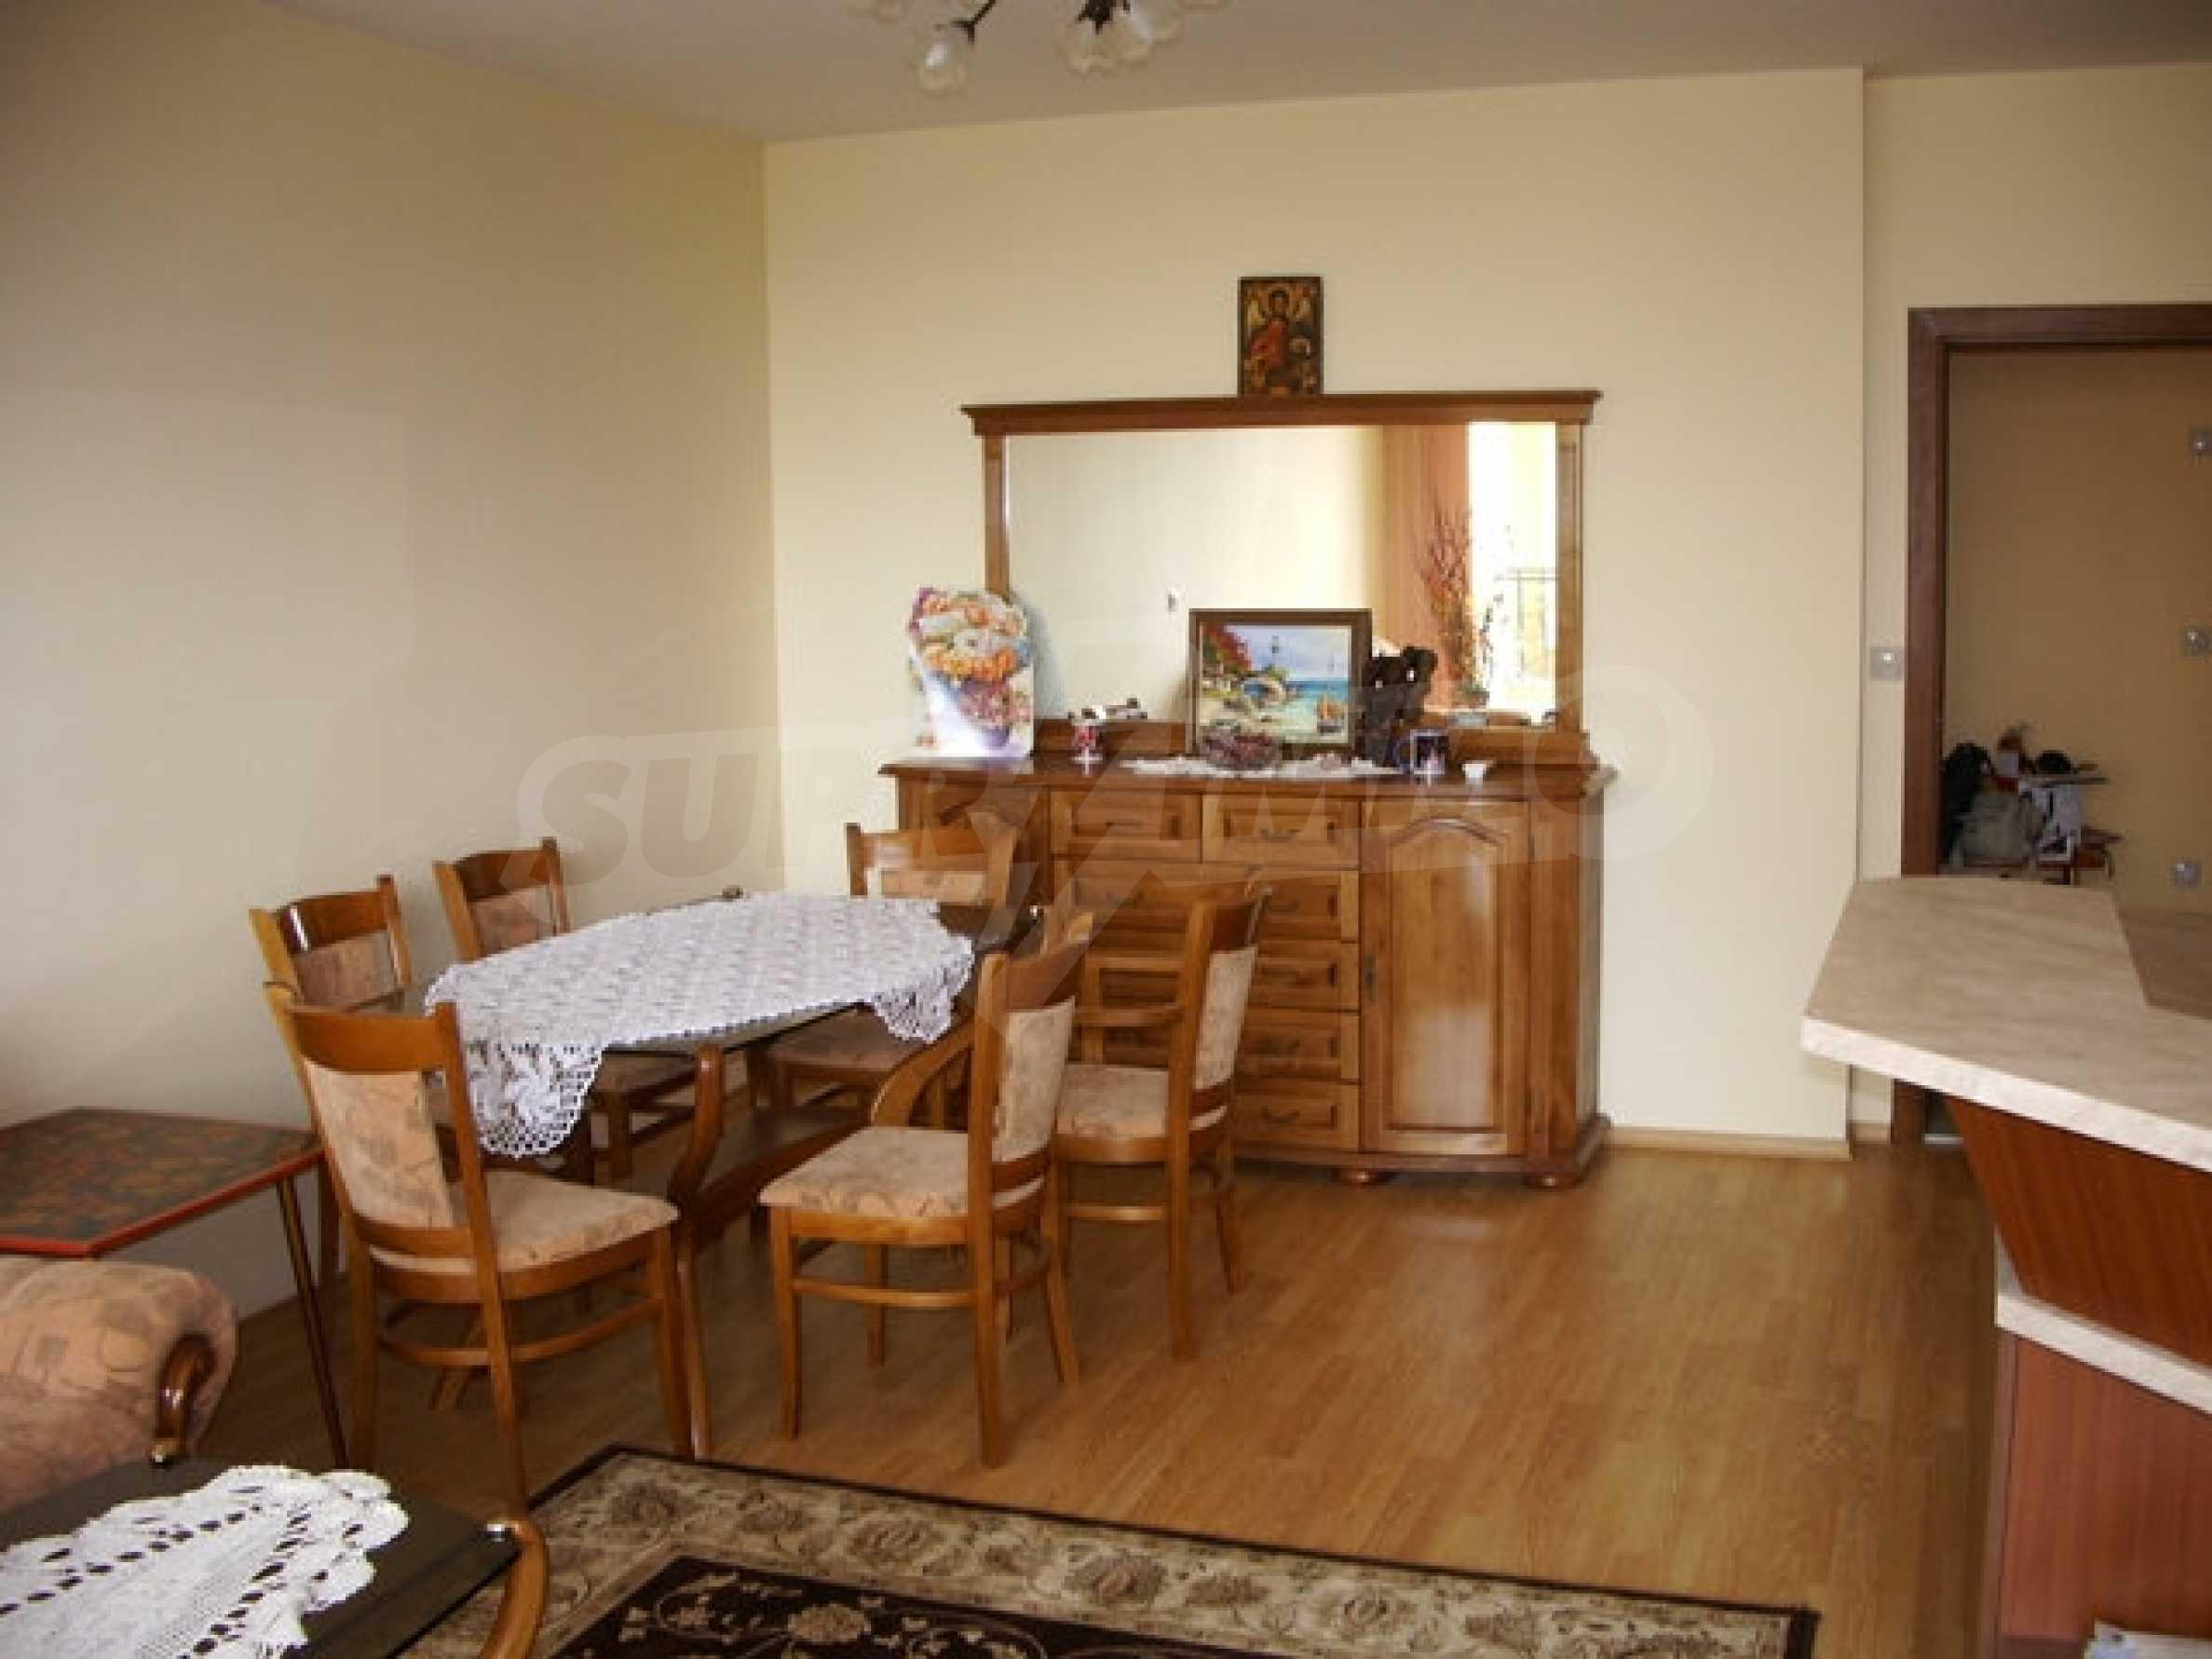 Квартира Евксиноград в Варне 1